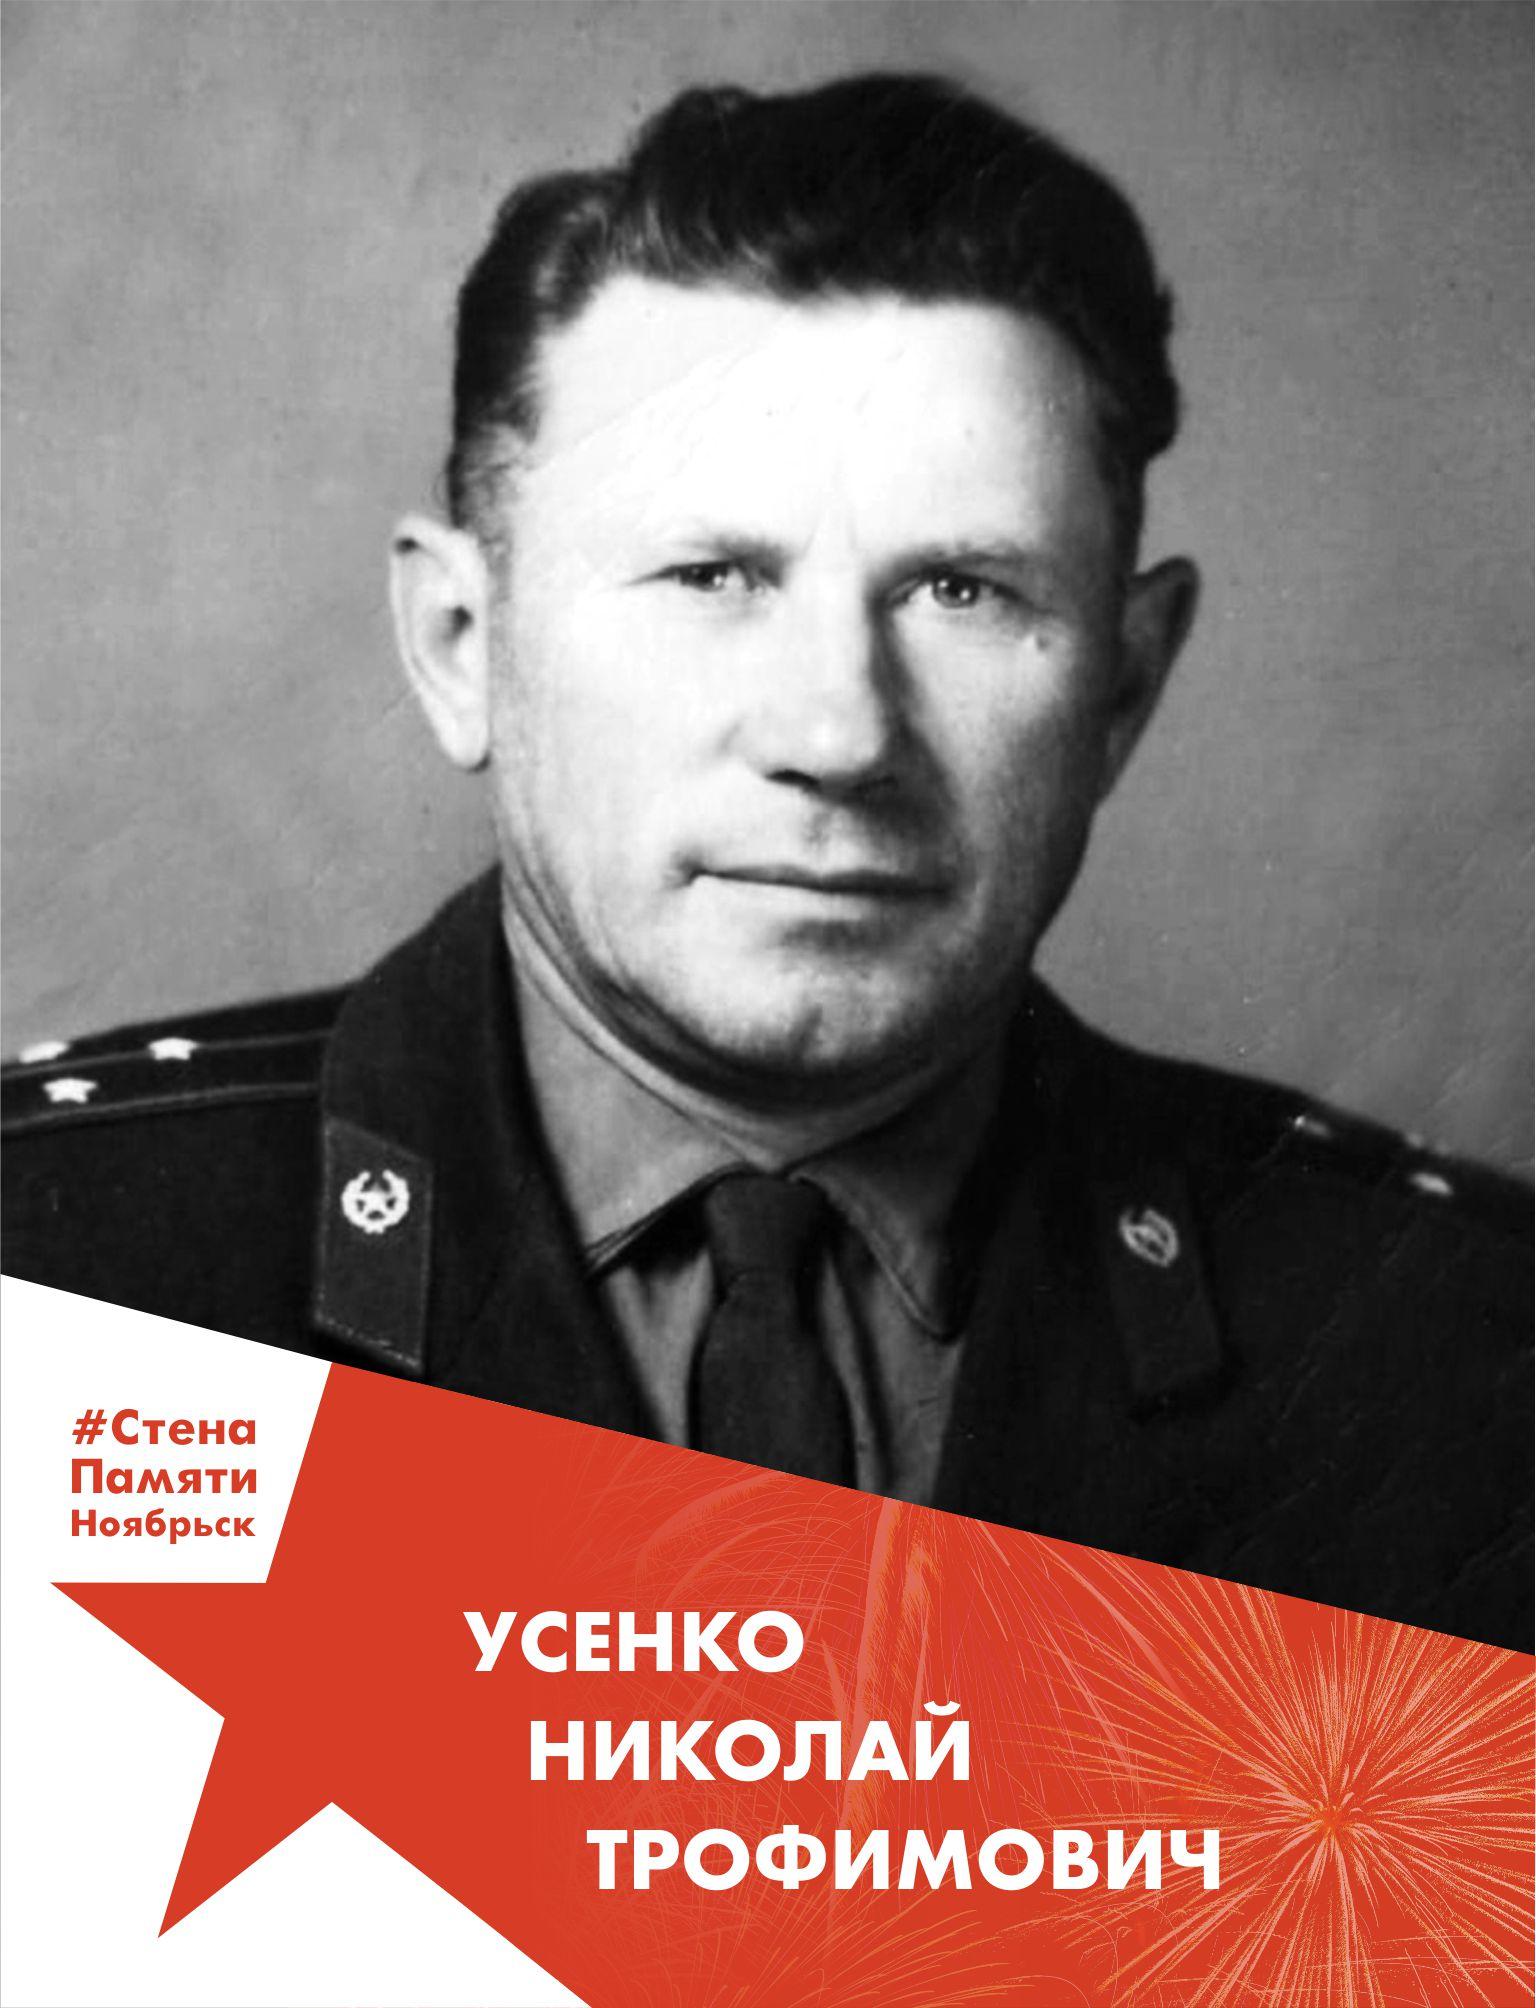 Усенко Николай Трофимович